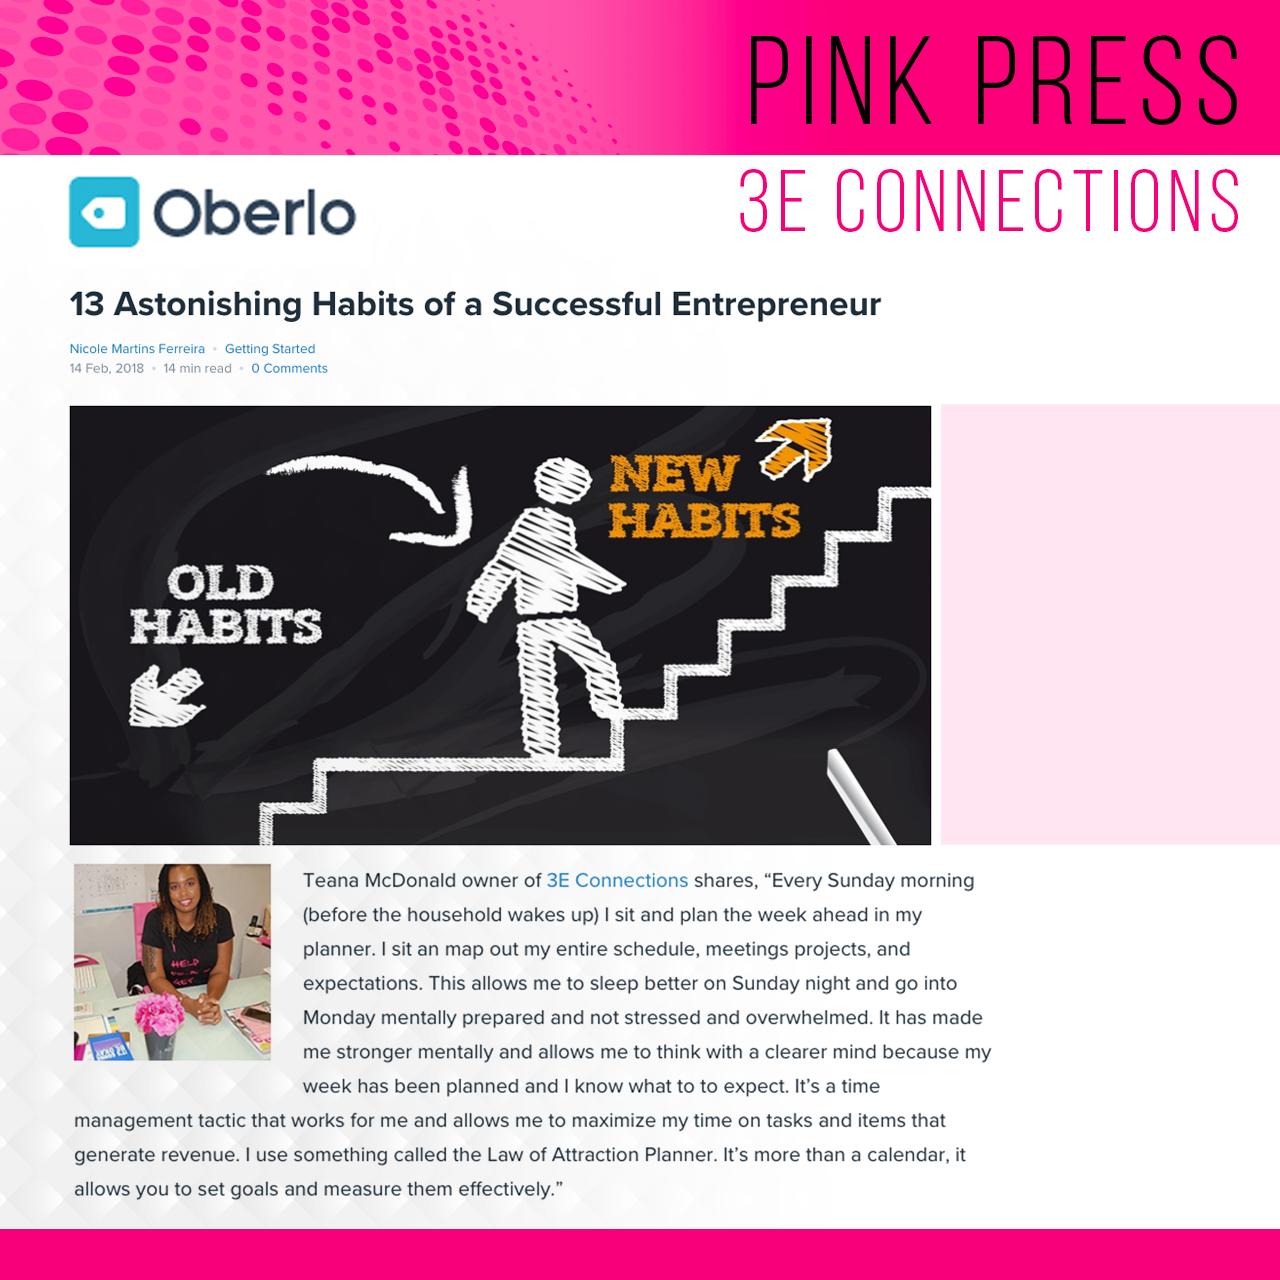 PinkPress_Oberlo.png